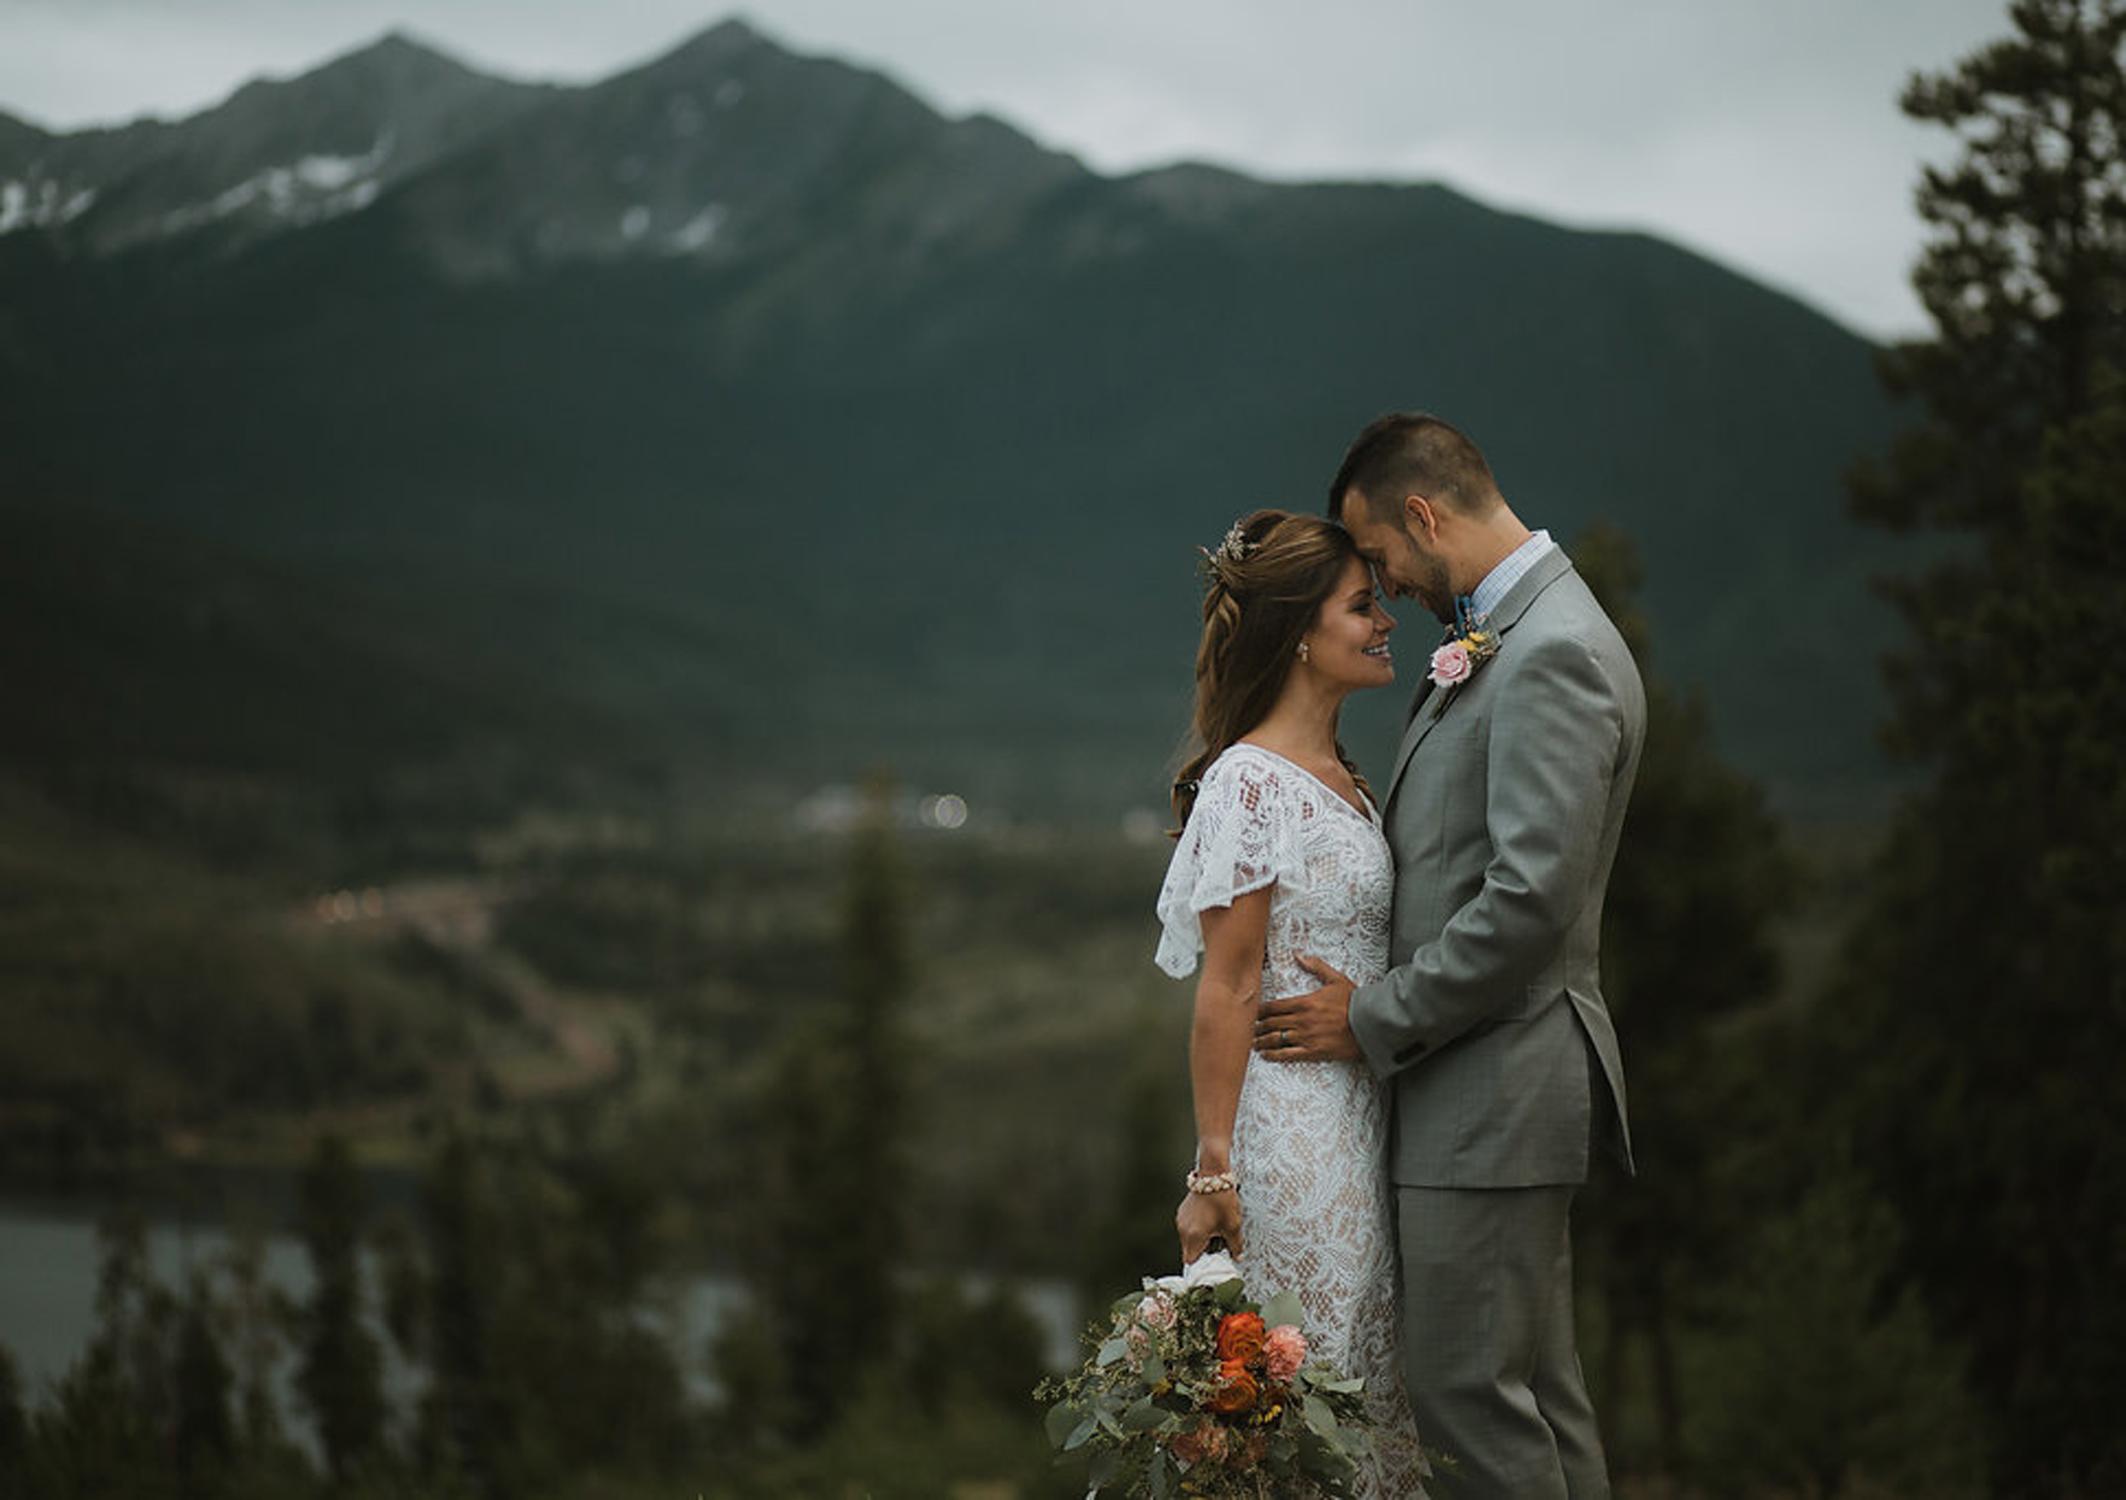 Boho Bride & Groom, boutineer & hand-tied bouquet - fresh flowers